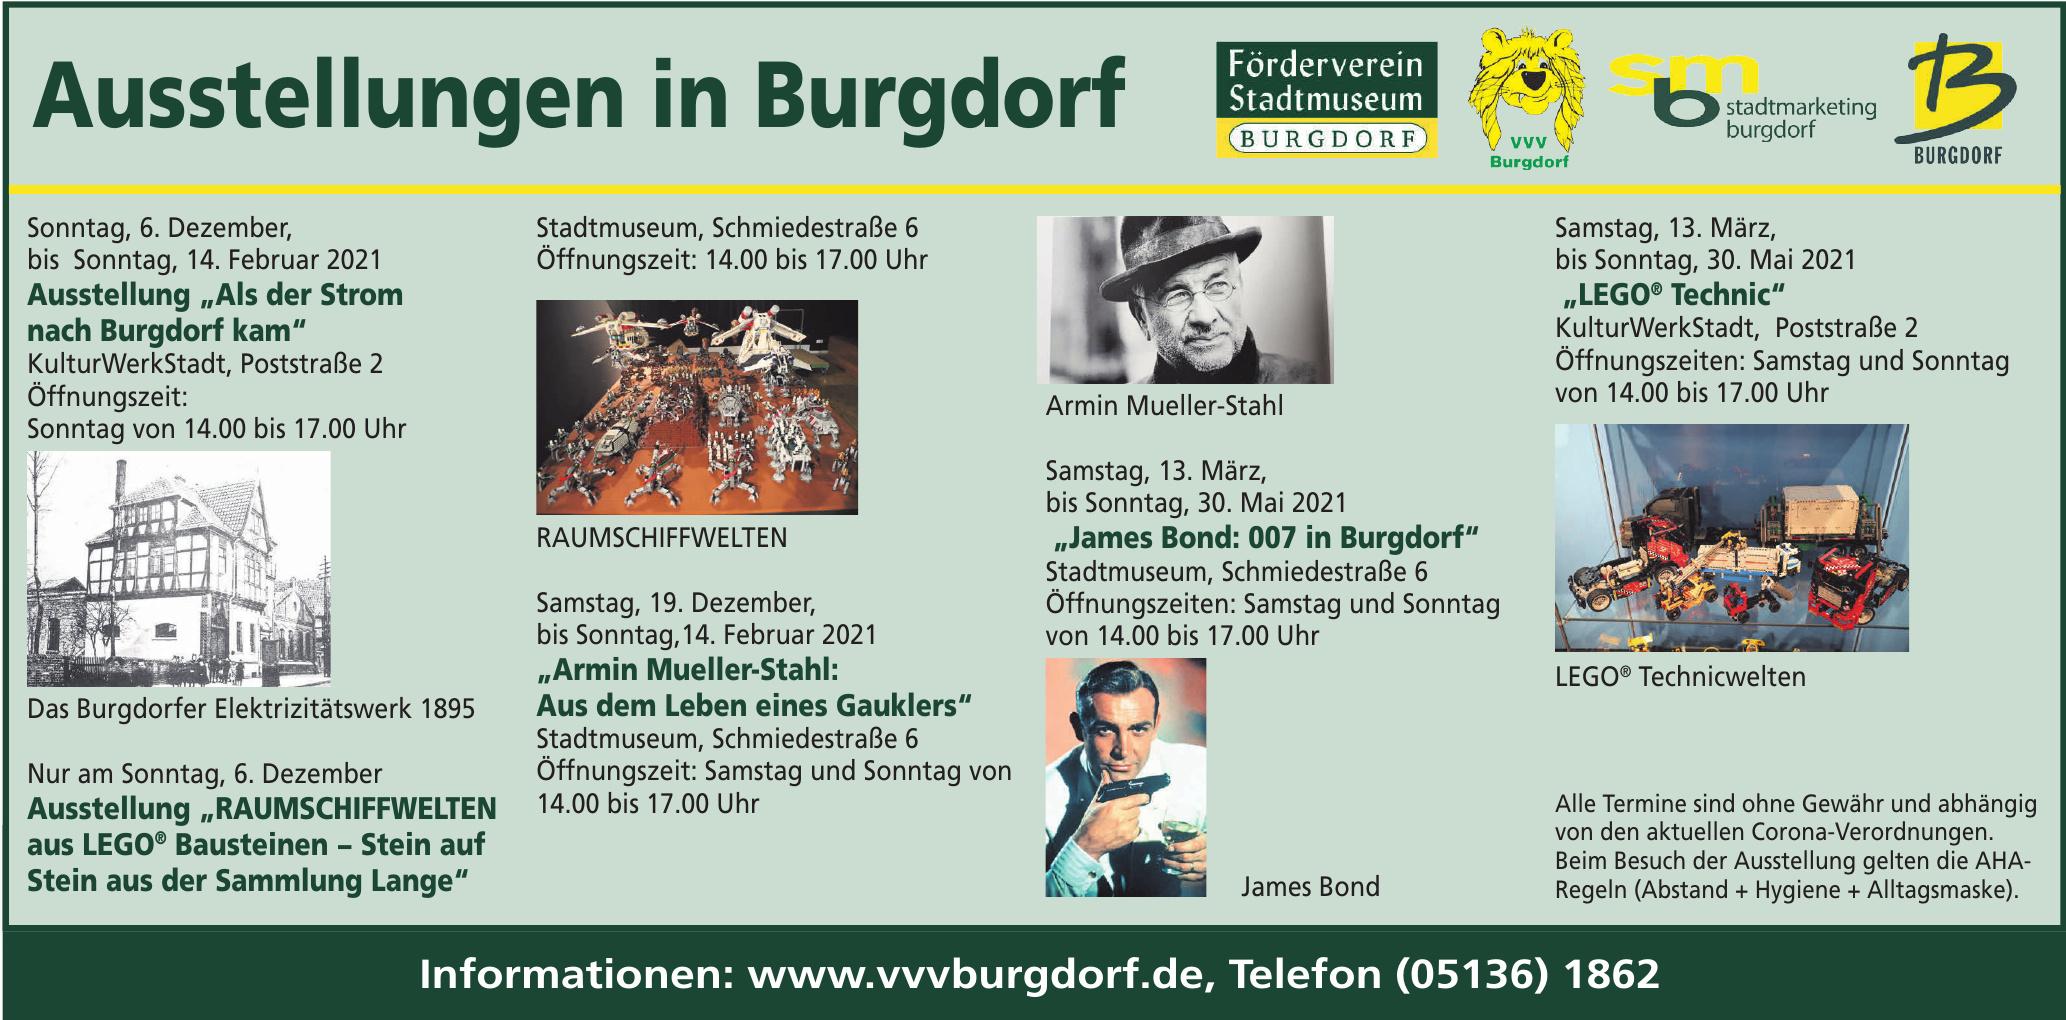 Stadtmarketing Burgdorf